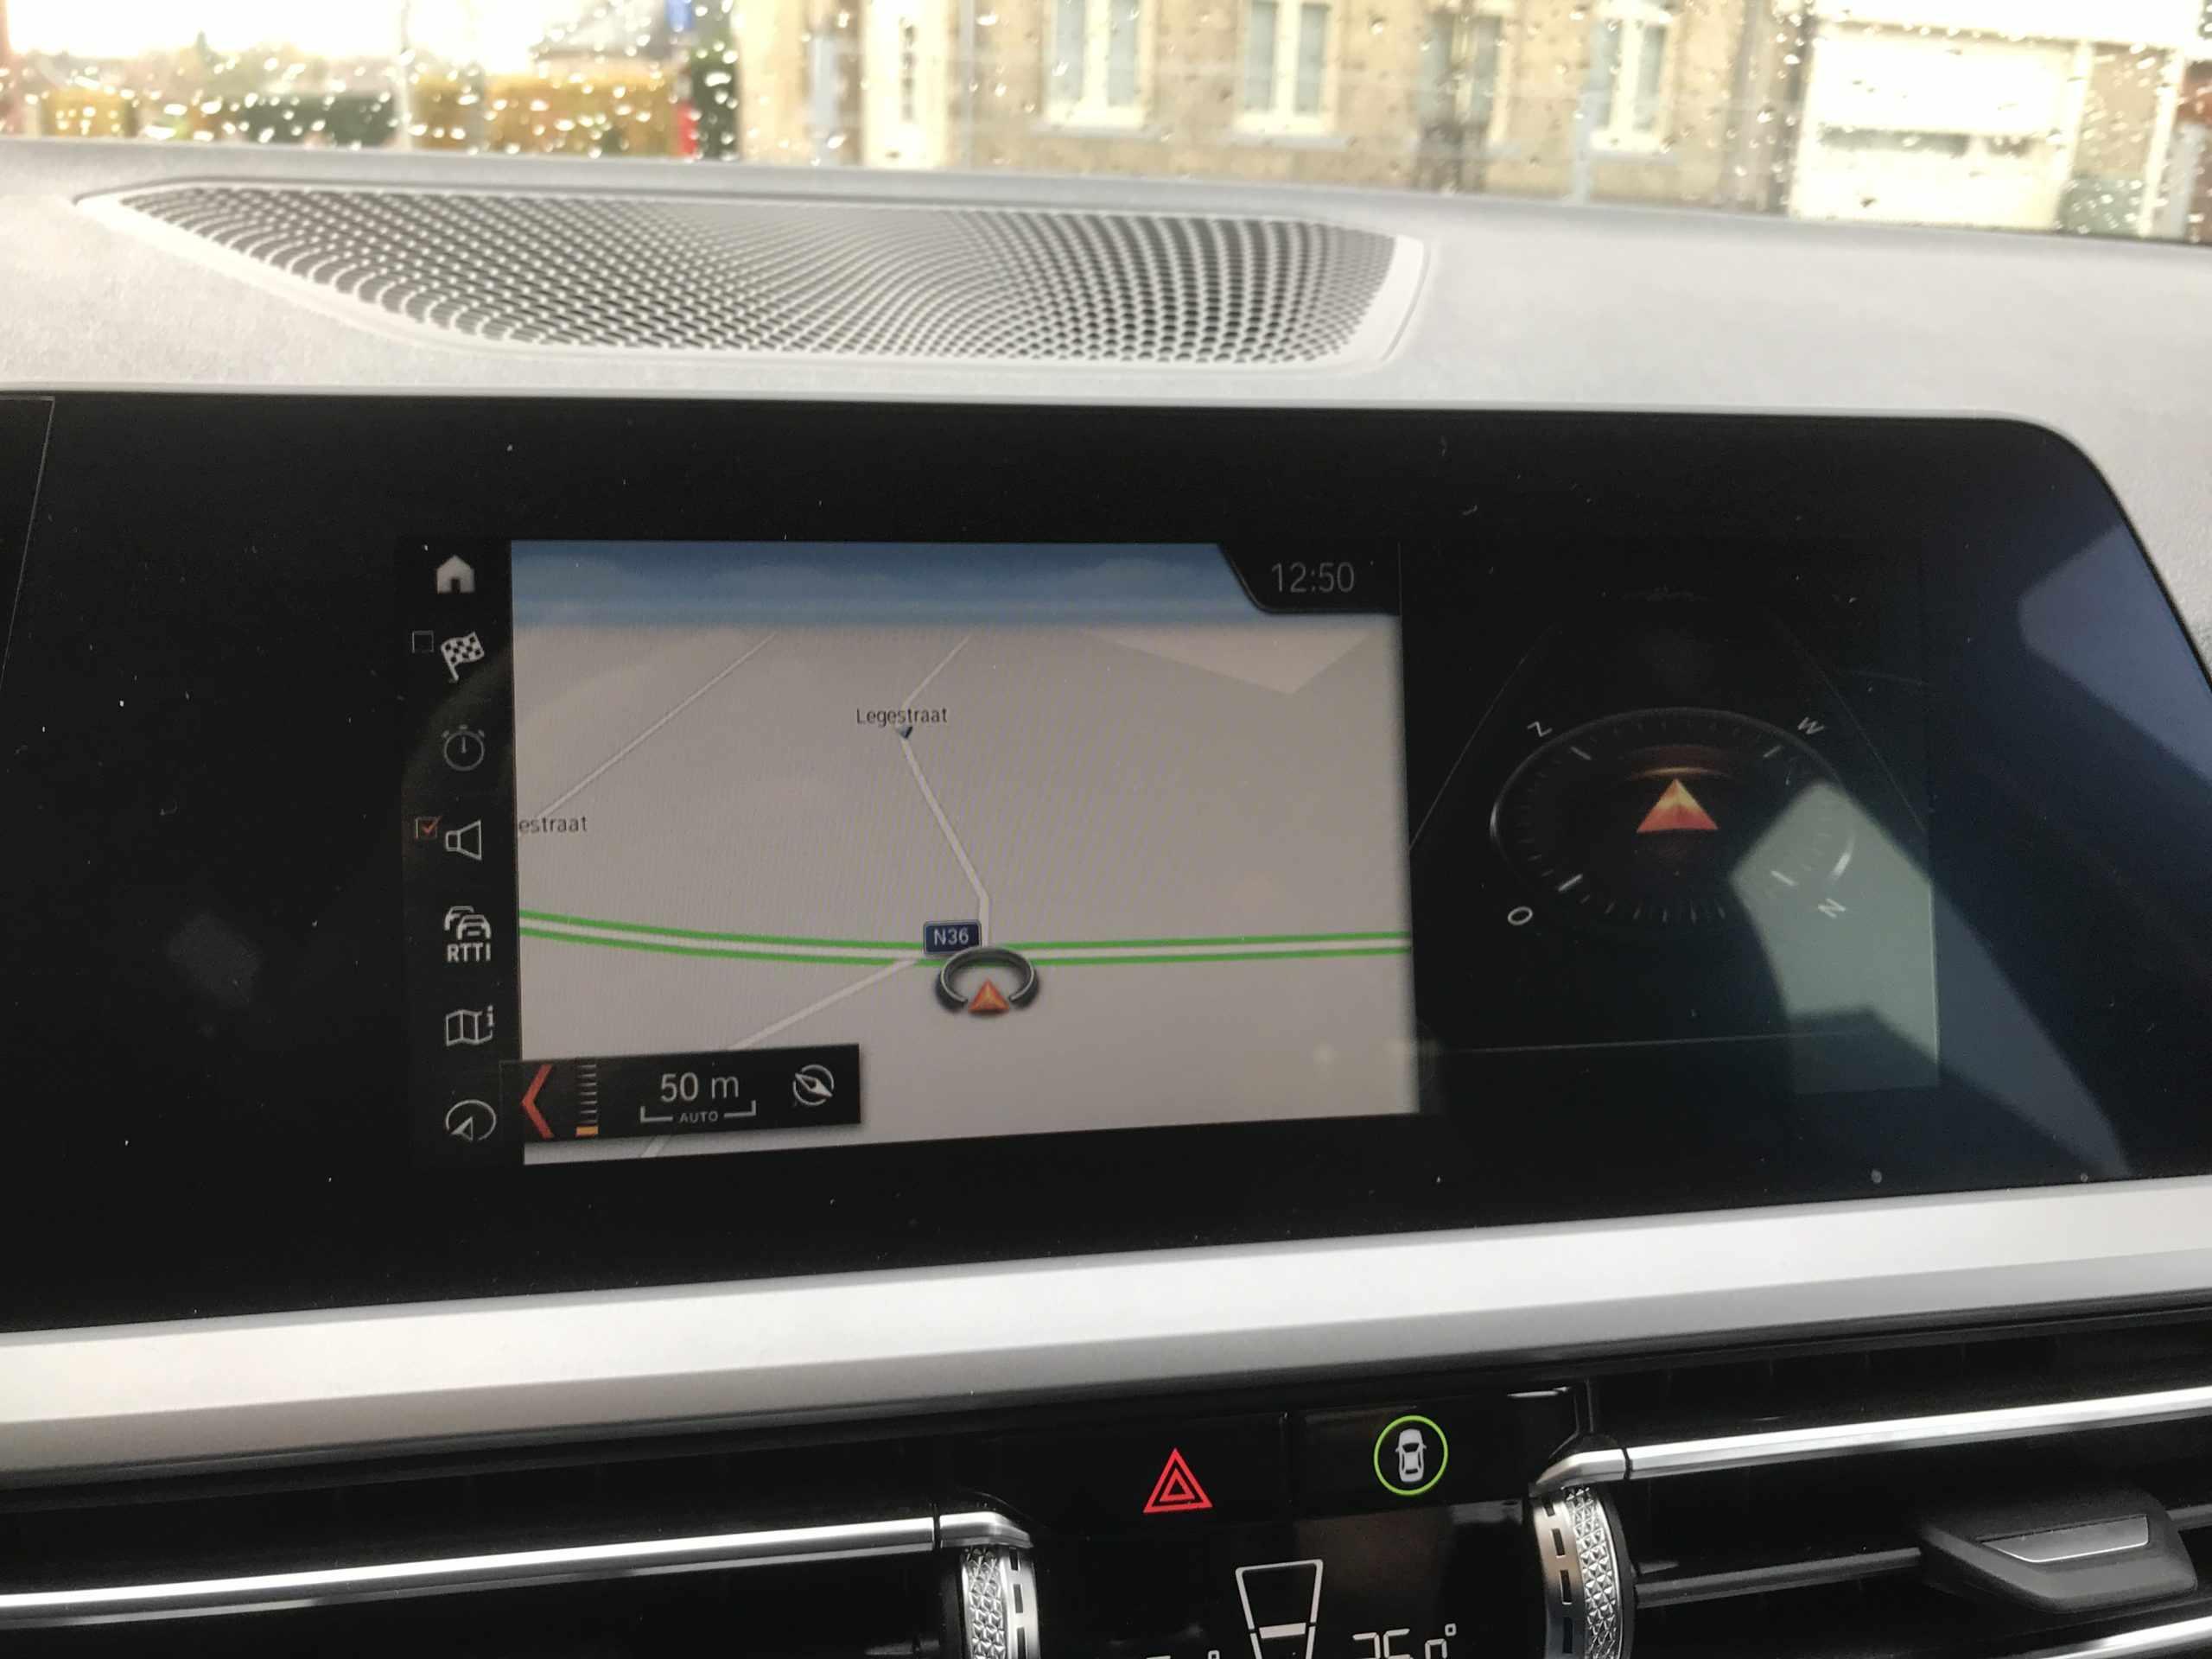 bmw 318d nieuw model 9000km!!